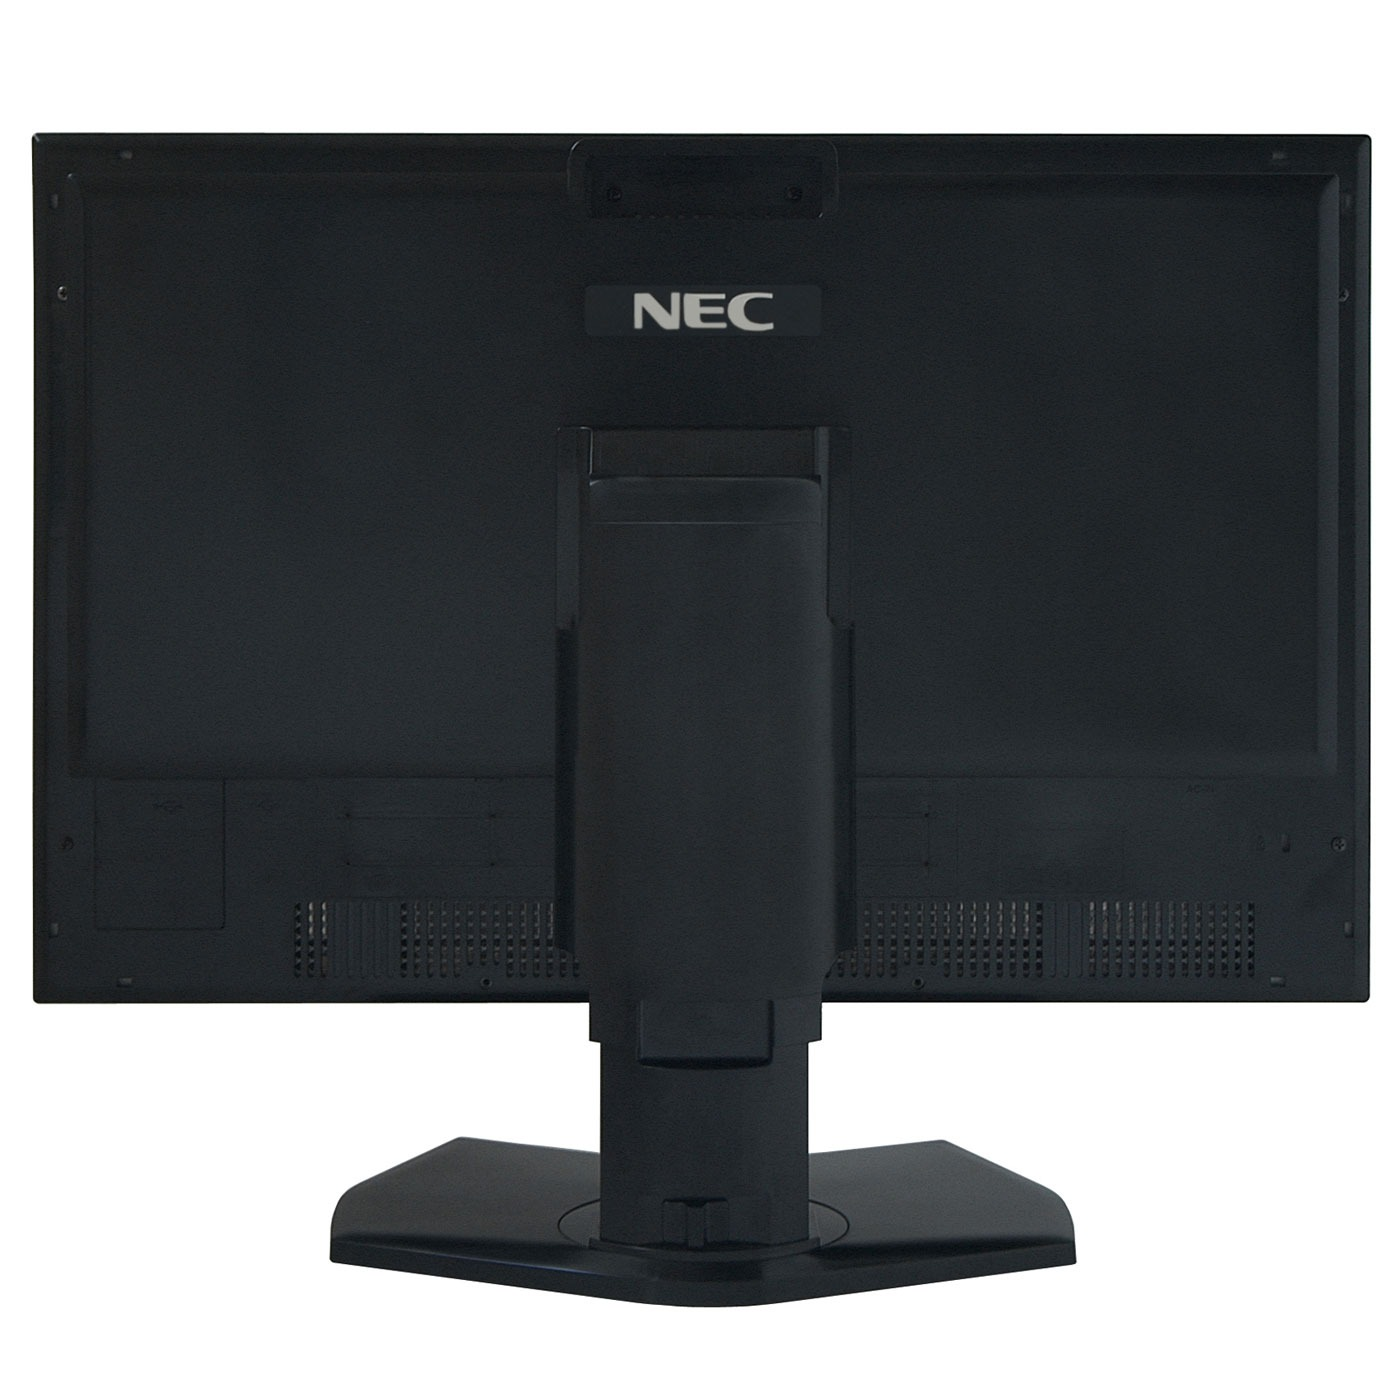 Nec 23 lcd multisync pa231w argent 60002927 achat for Ecran photo nec